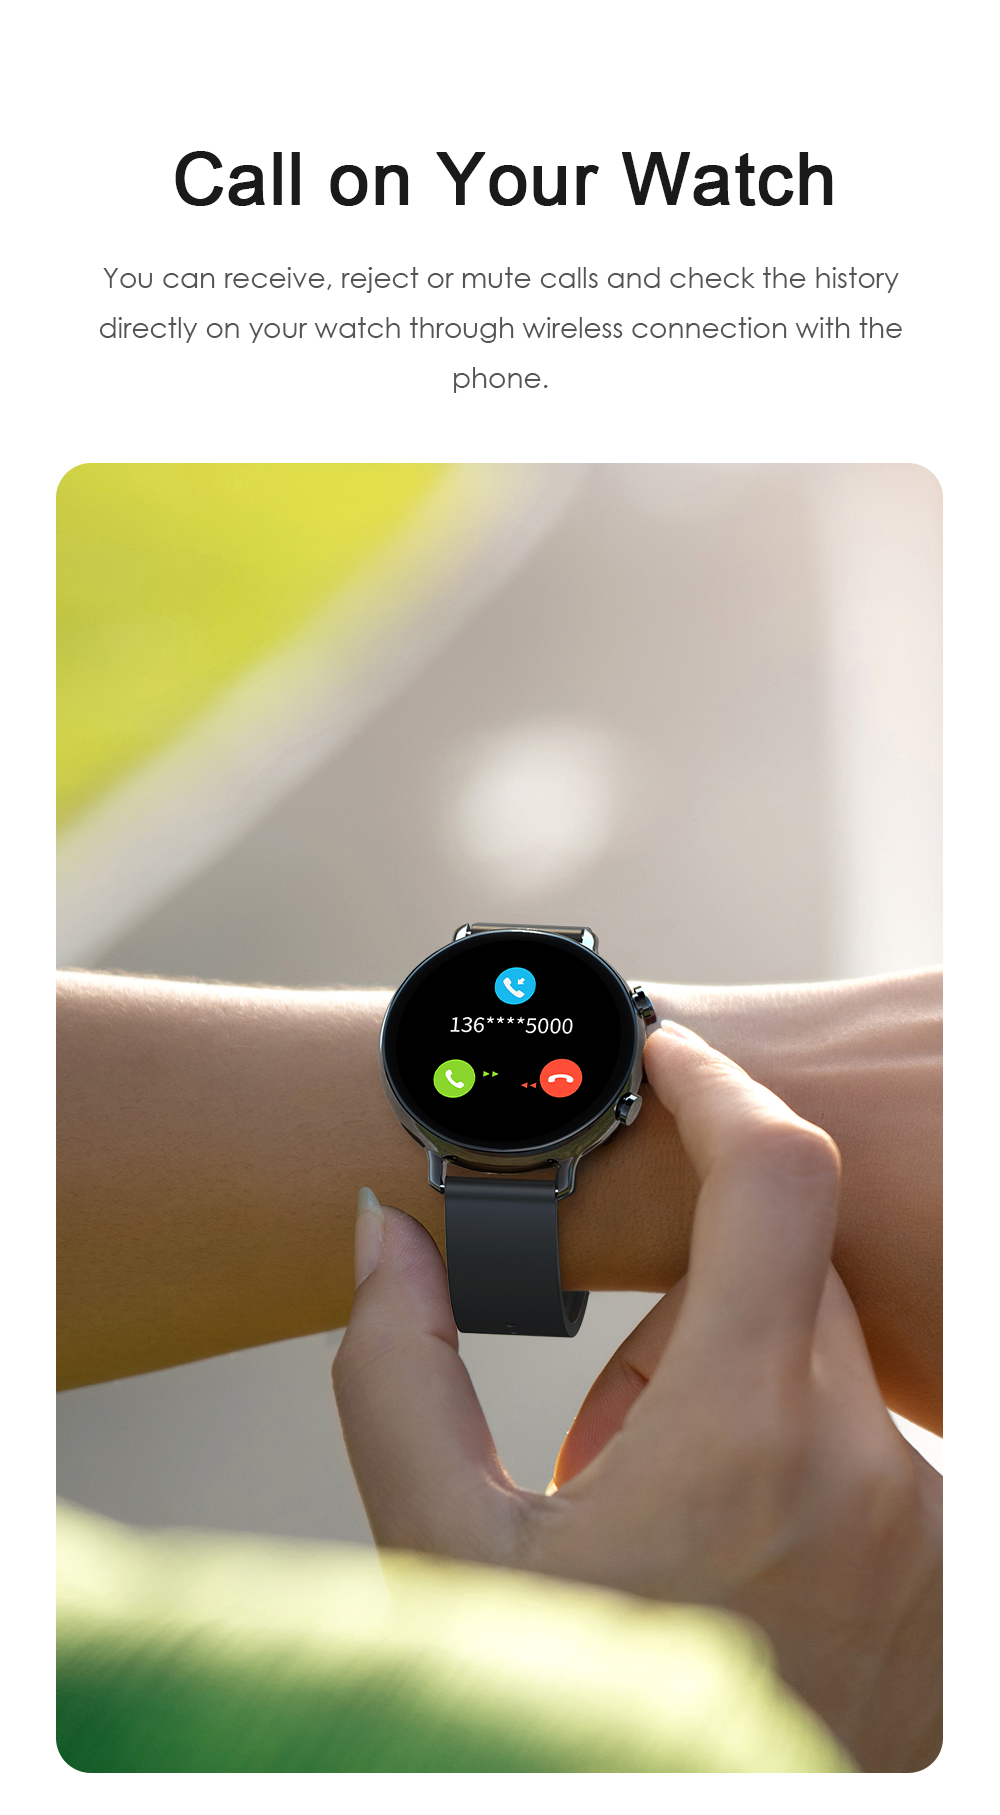 He520435238f5451a8d6ed0e13ed67e44s SANLEPUS 2021 Smart Watch Dial Calls Men Women Waterproof Smartwatch ECG PPG Fitness Bracelet Band For Android Apple Xiaomi